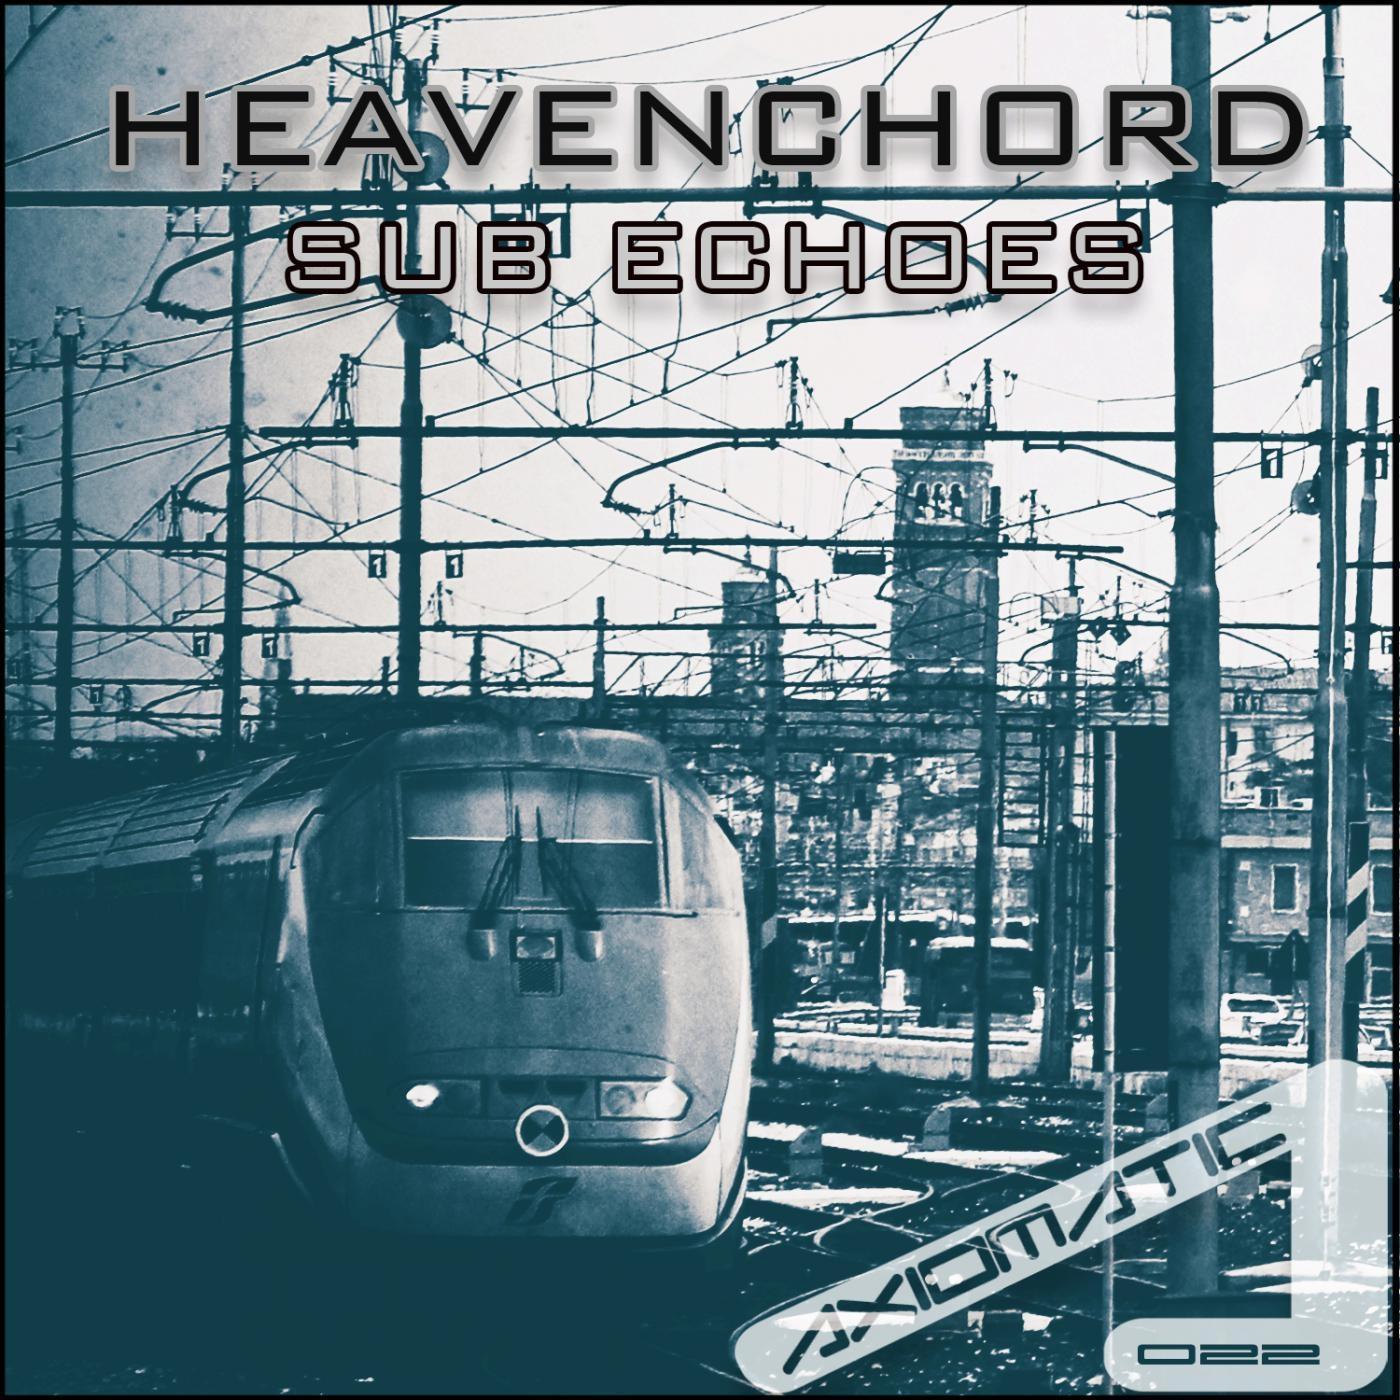 Heavenchord - Through The Woods (Original mix)